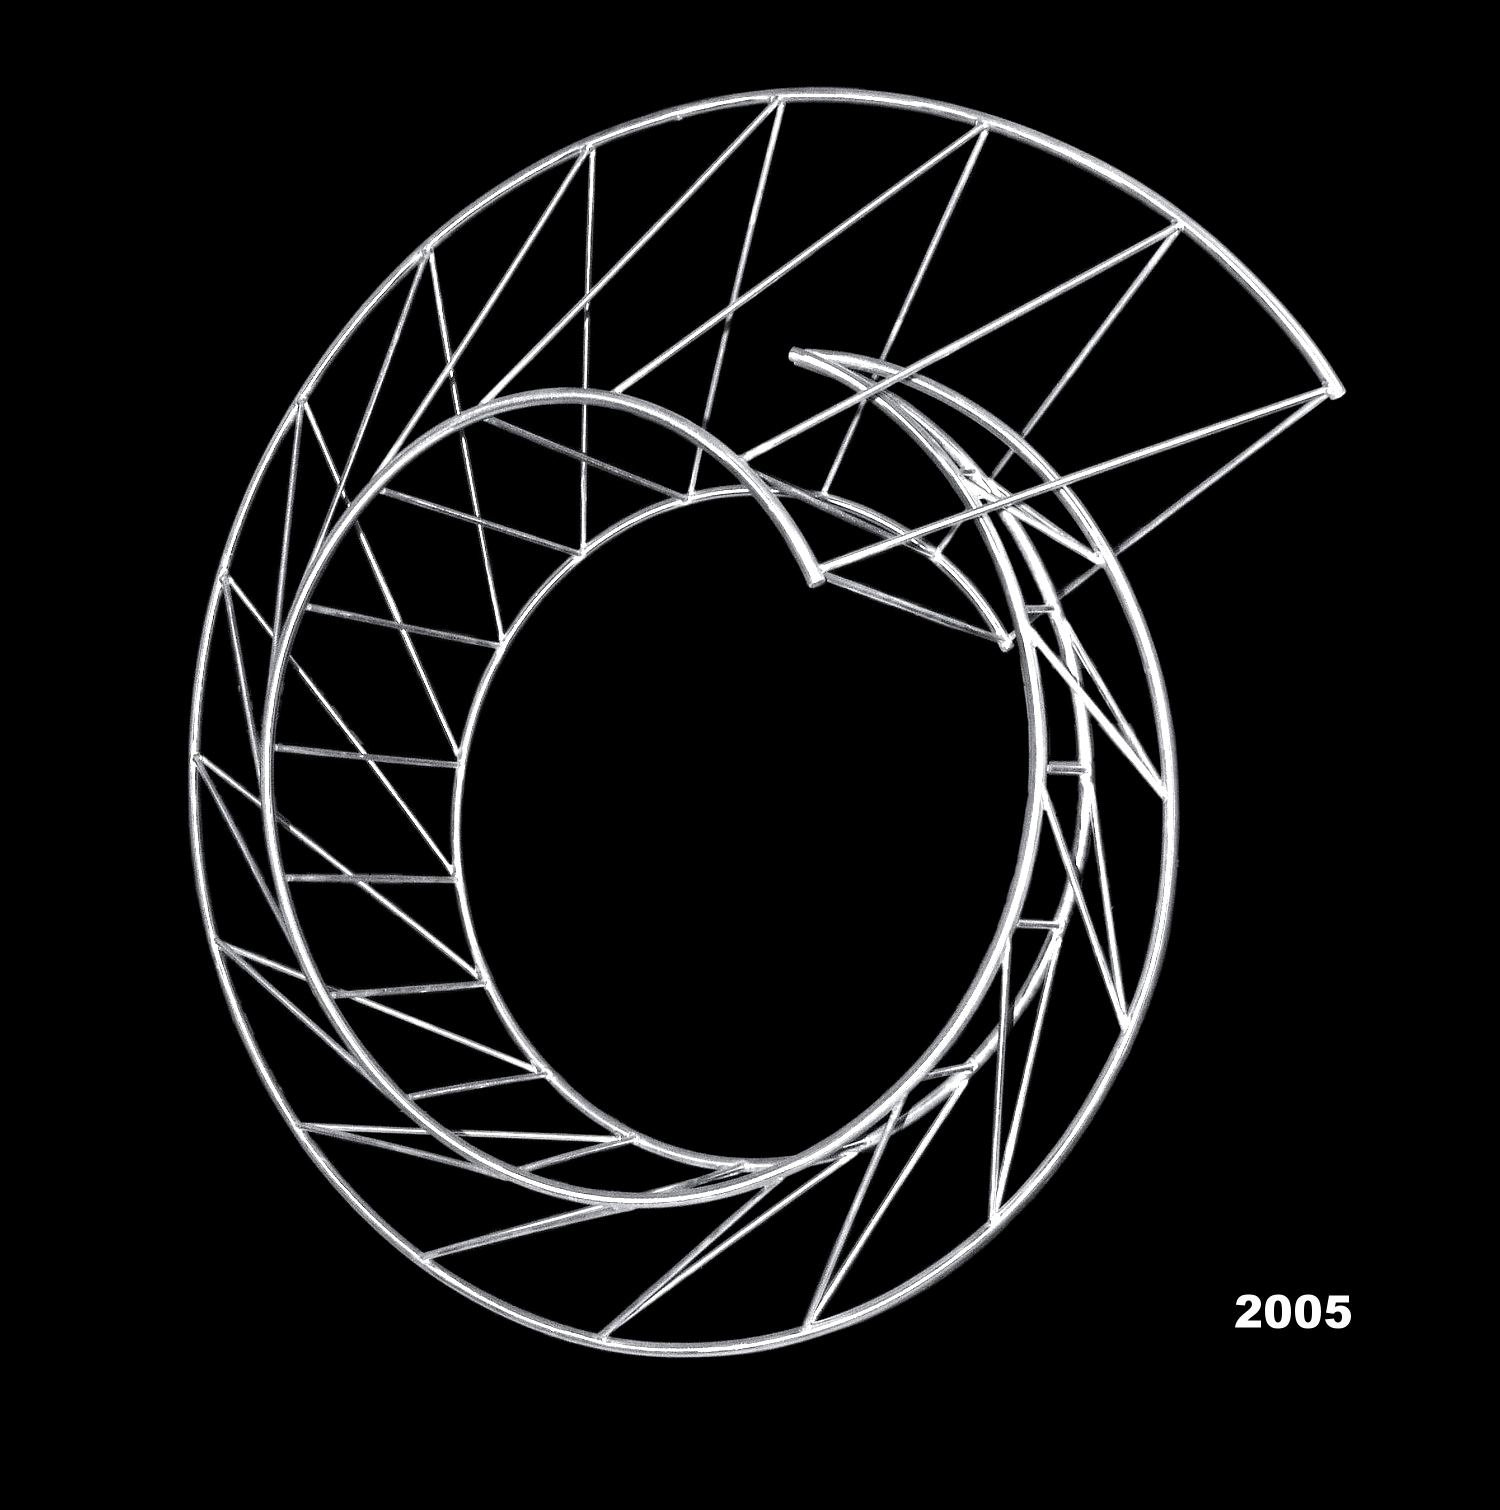 Ouroboros-2005.JPG